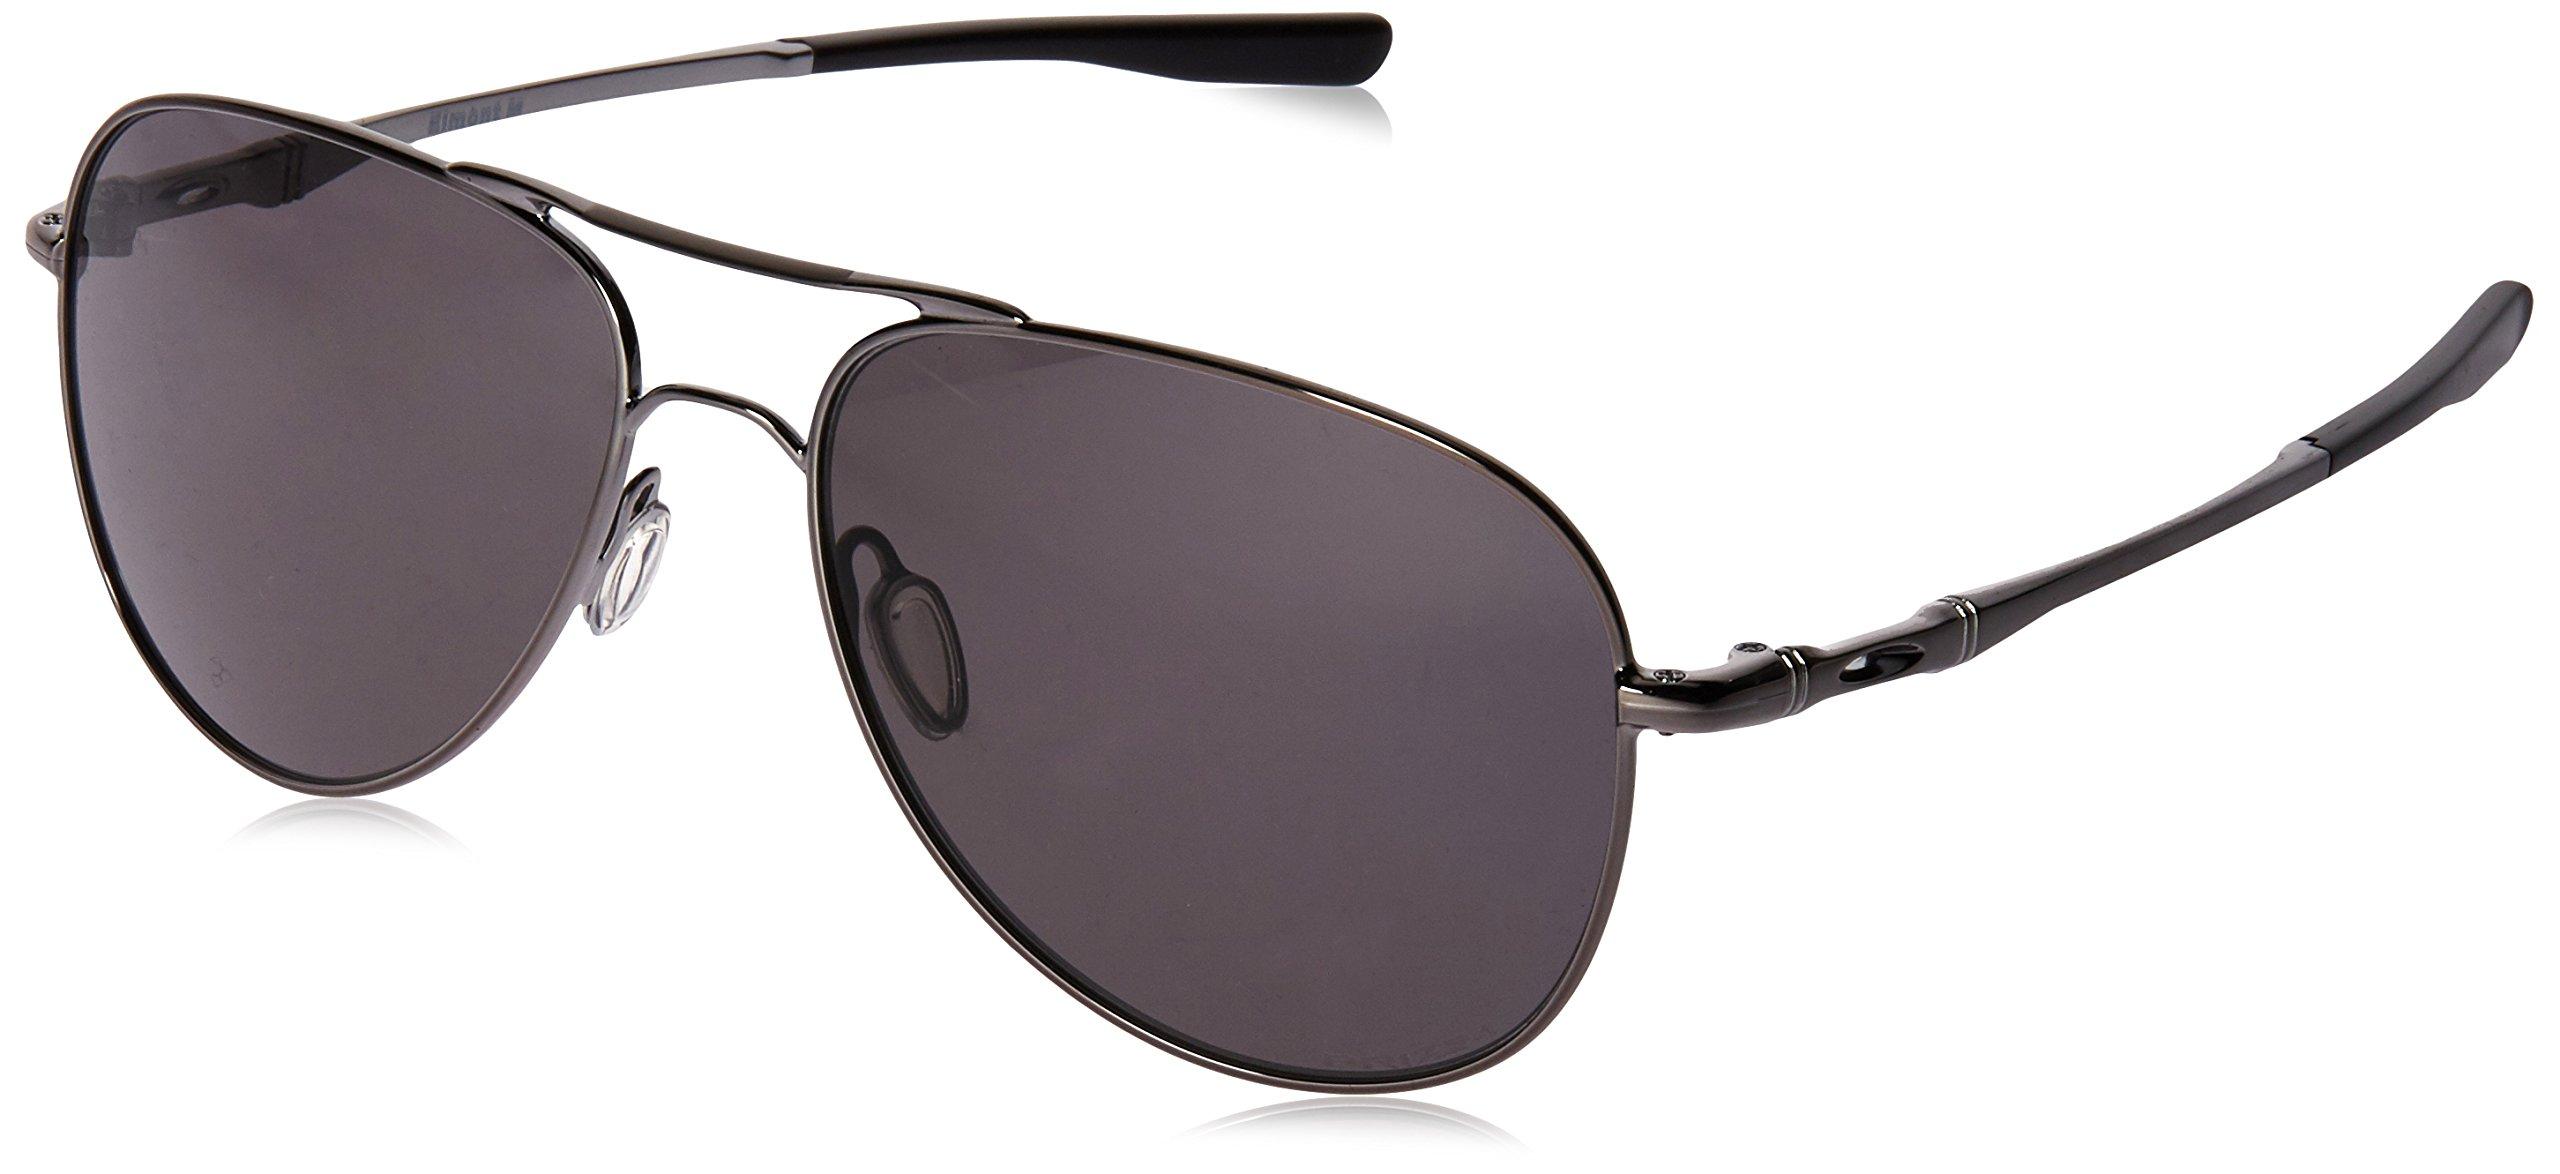 Oakley Men's Elmont M Sunglasses,Polished Gunmetal